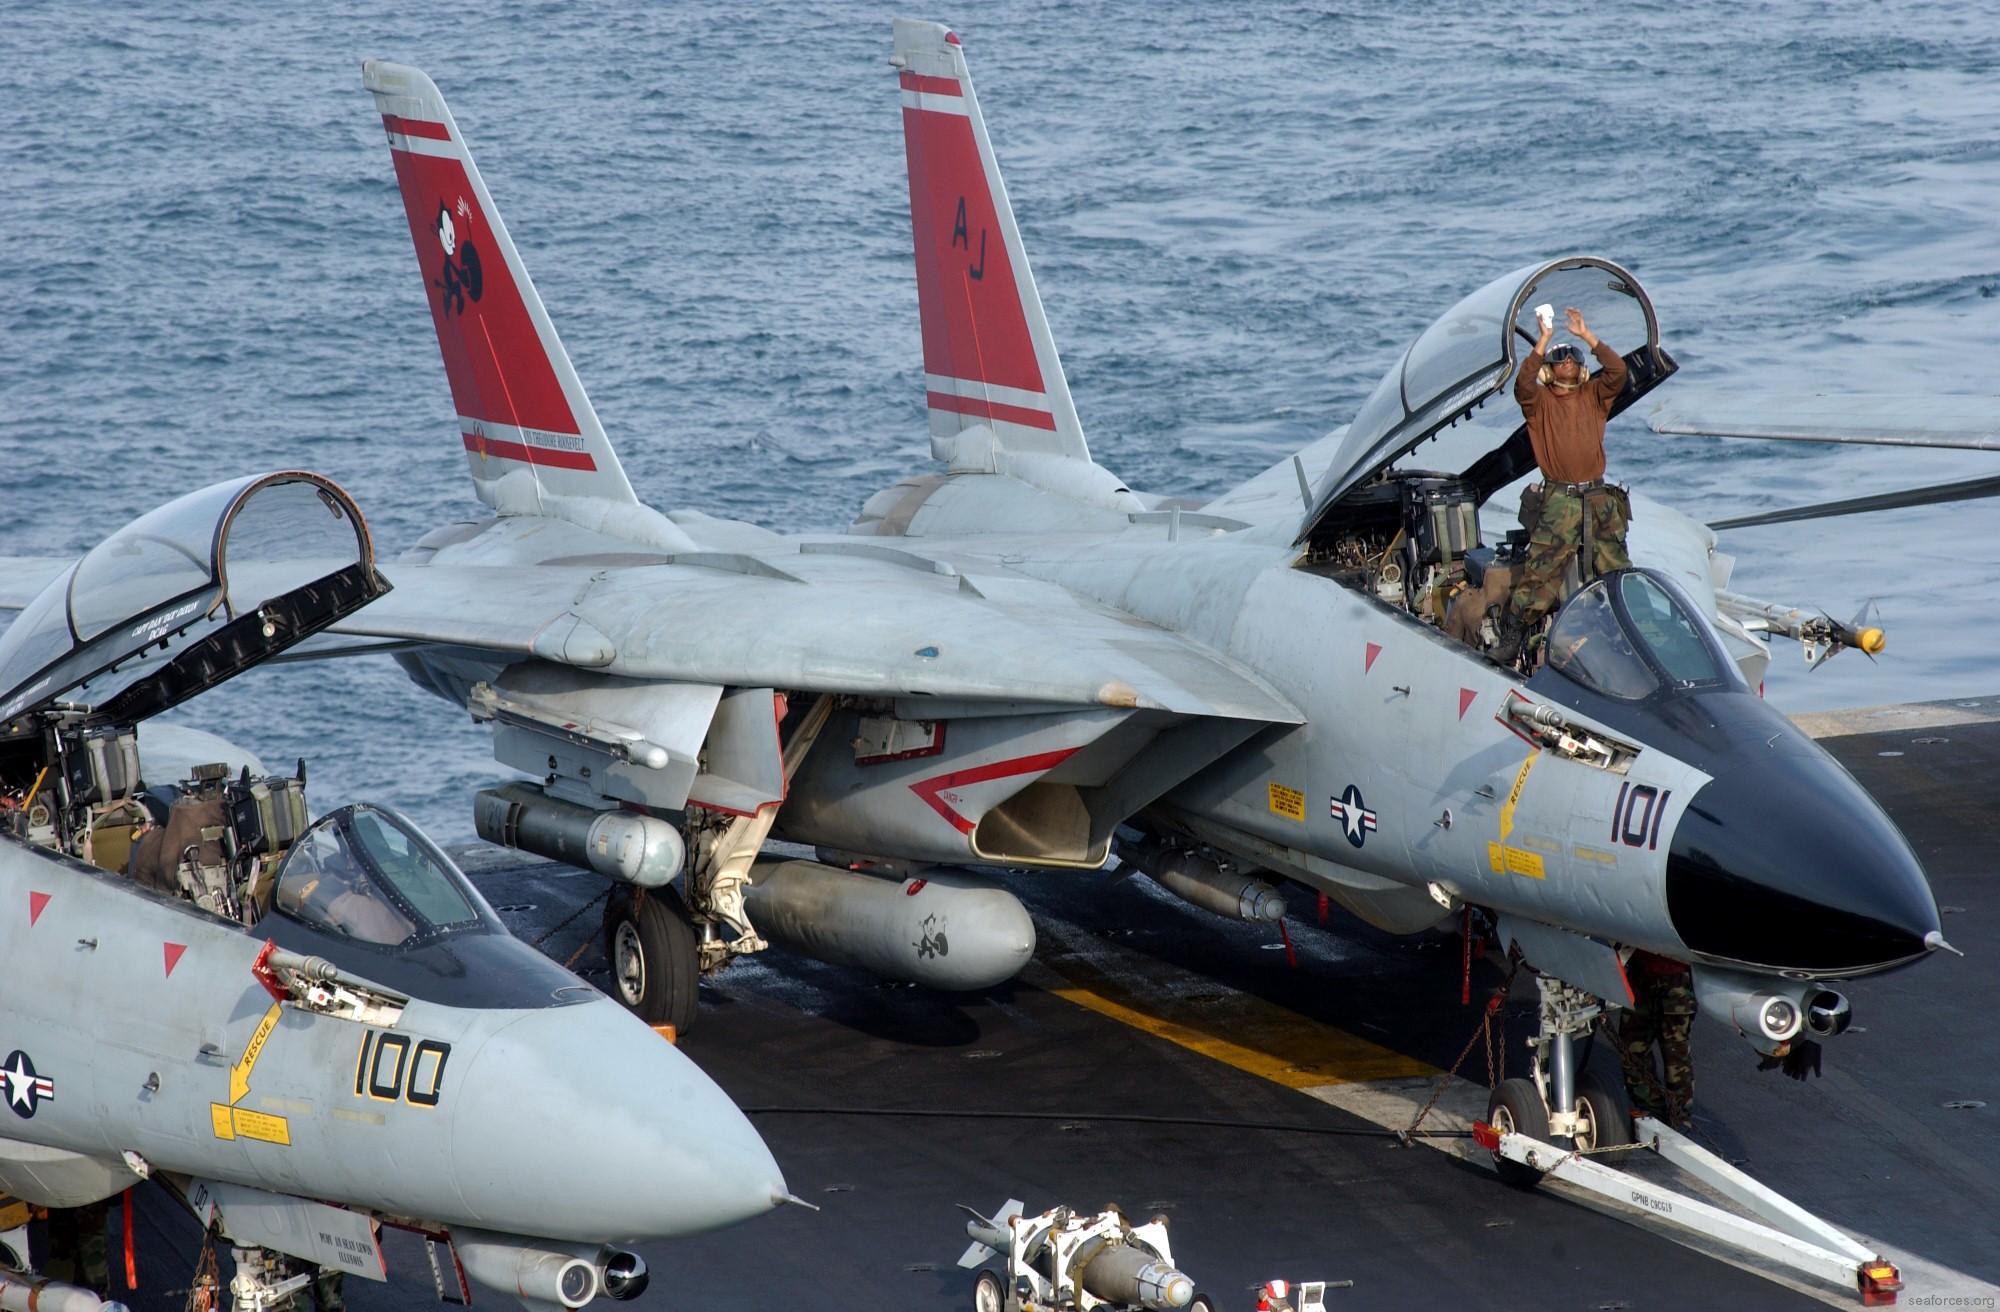 VF-31 TOMCATTERS PATCH F-14 TOMCAT Felix Red Version NAS OCEANA NAVY VFA USS